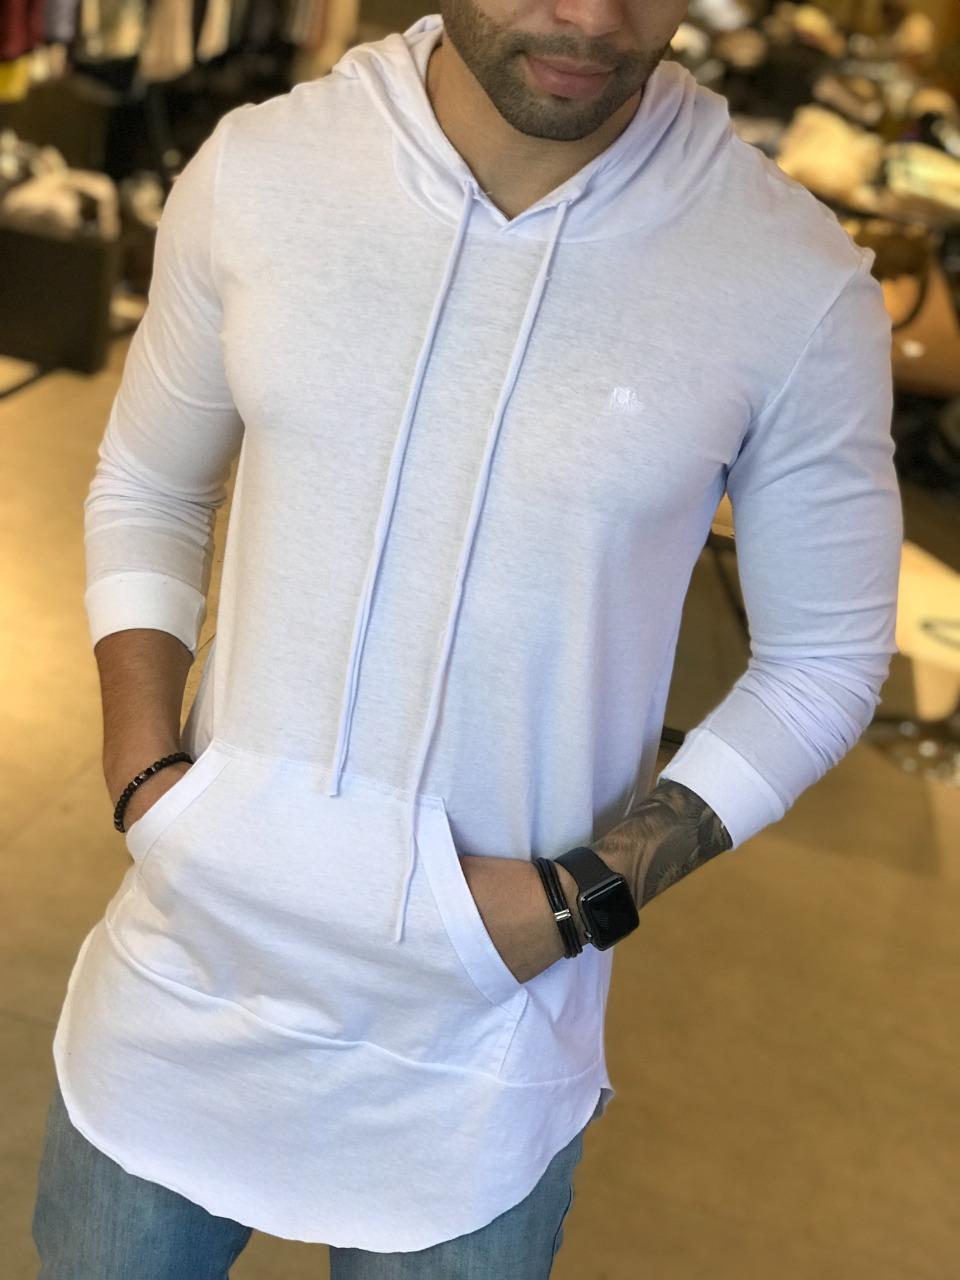 Camiseta Manga Longa M Artt Branca Bolso Detalhes   - Harpia Moda - Moda Masculina & Acessórios